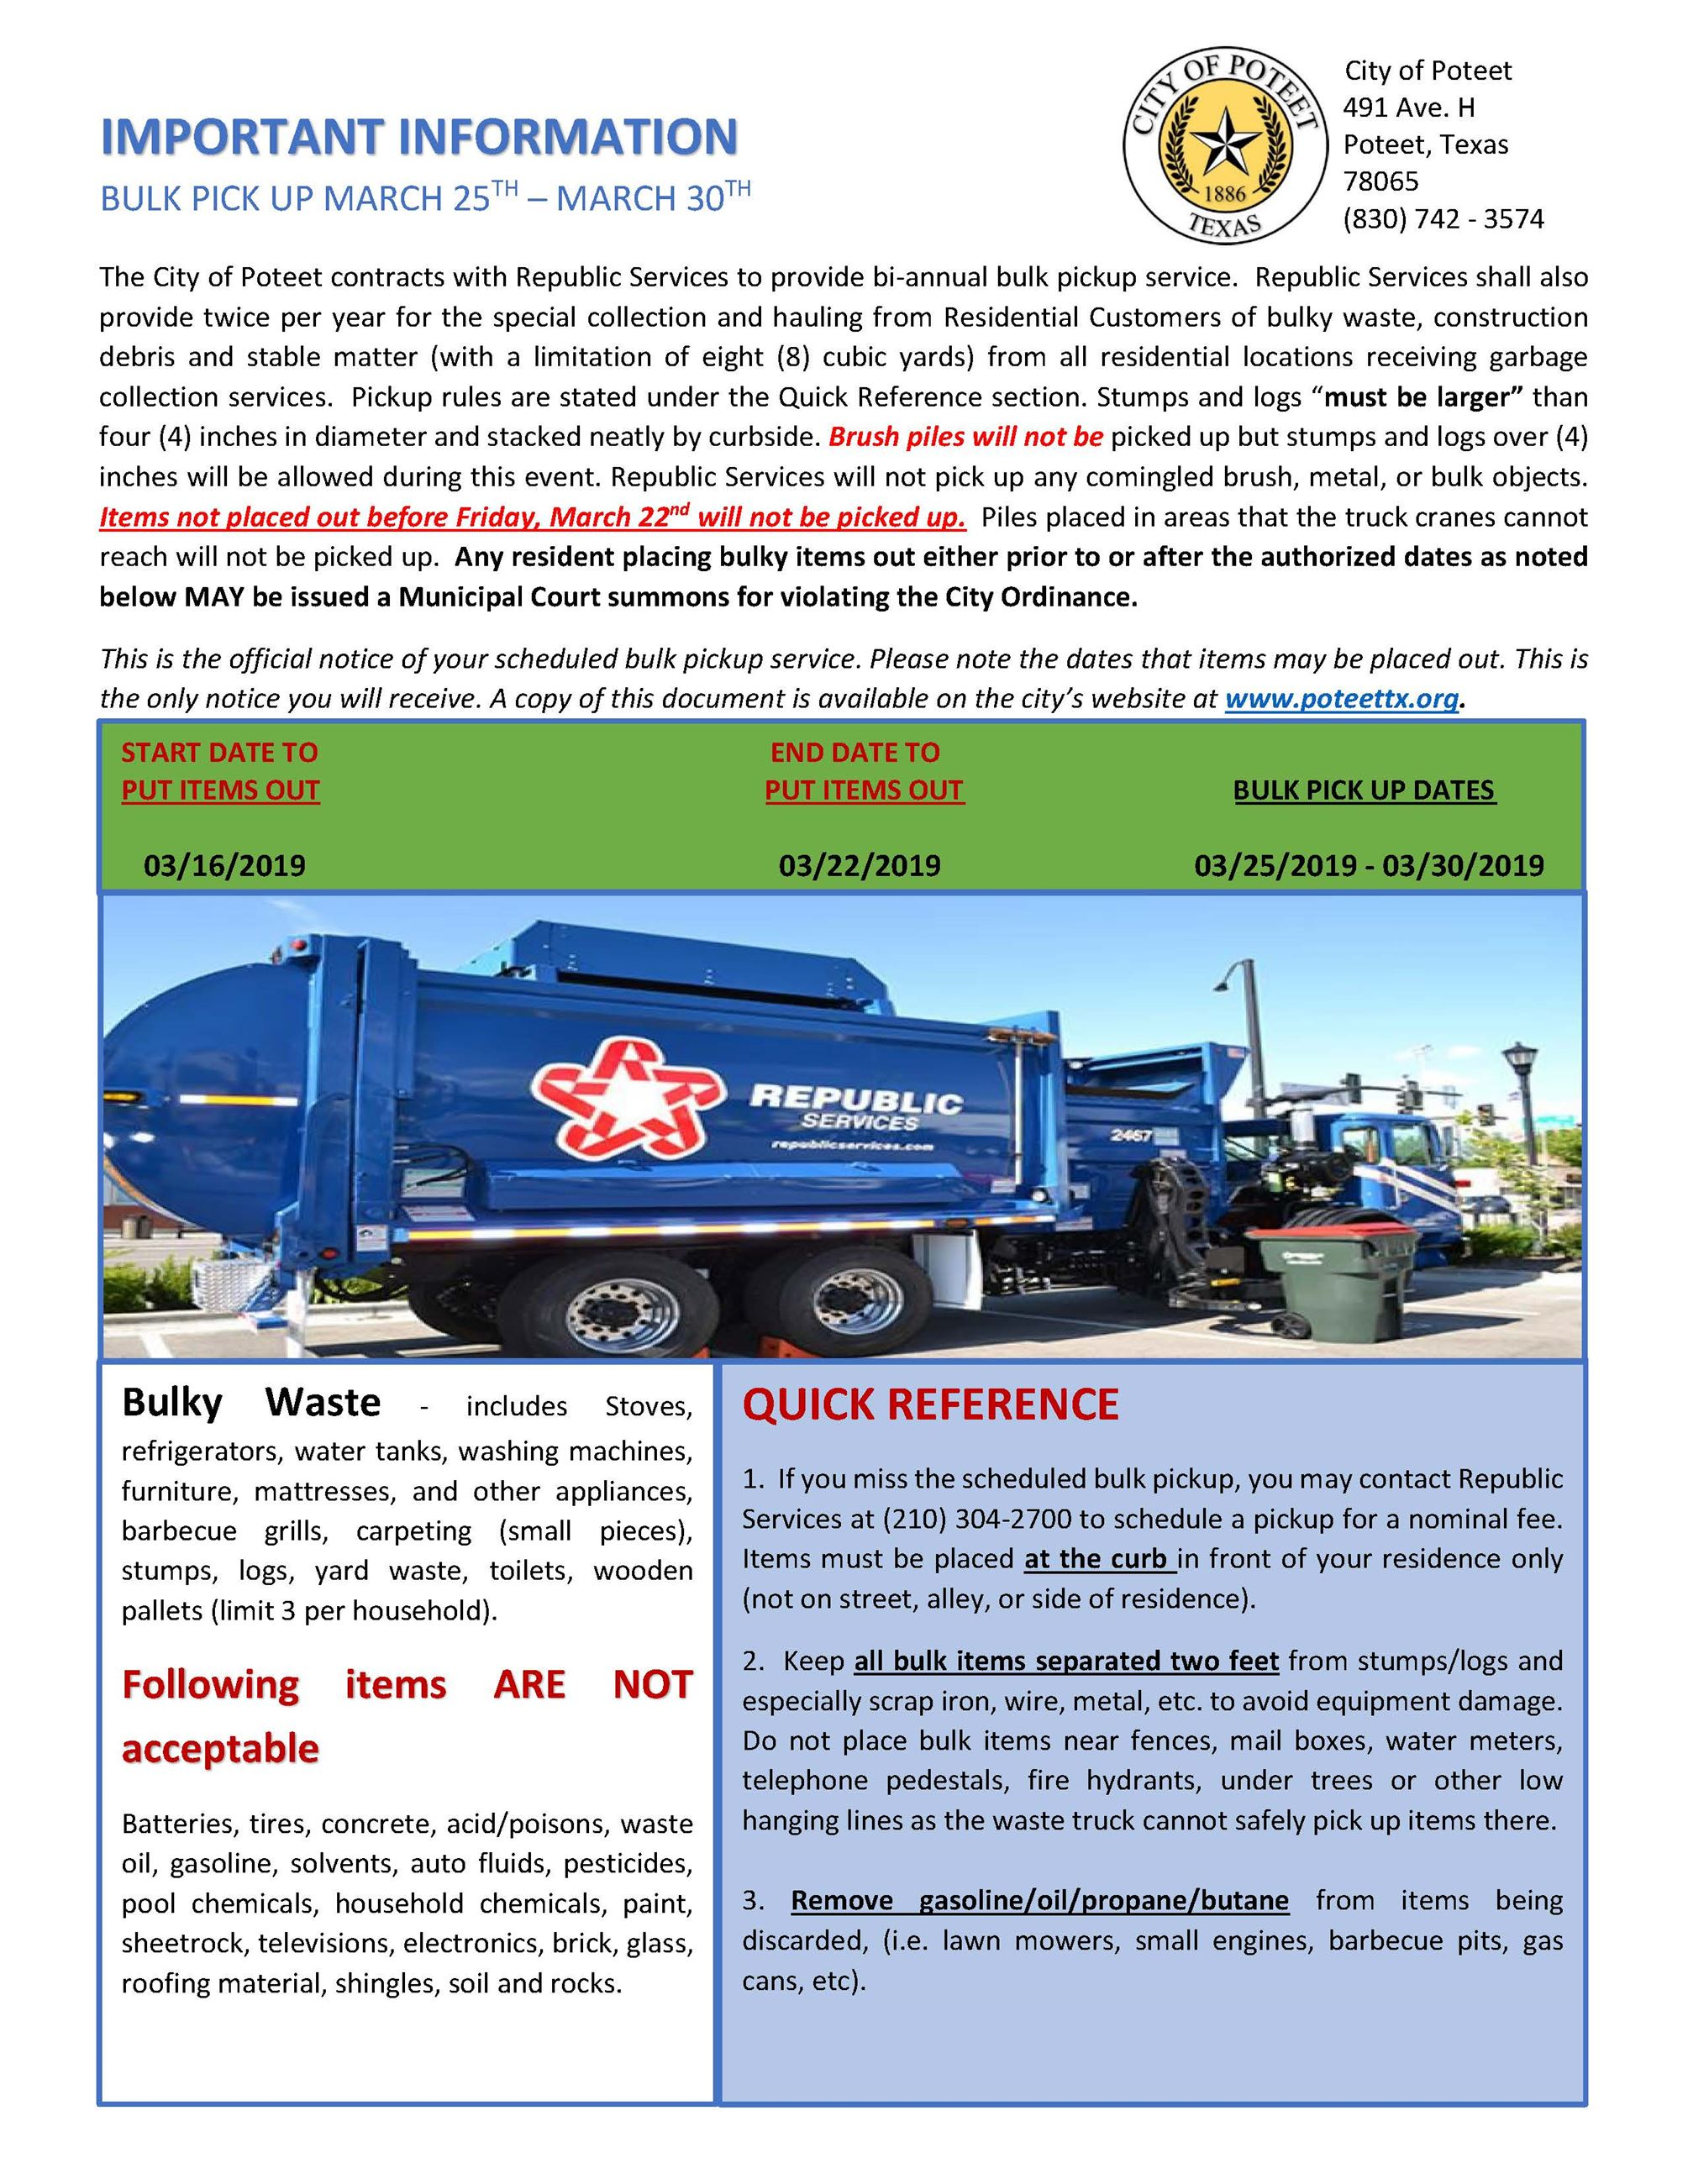 Poteet, TX - Official Website